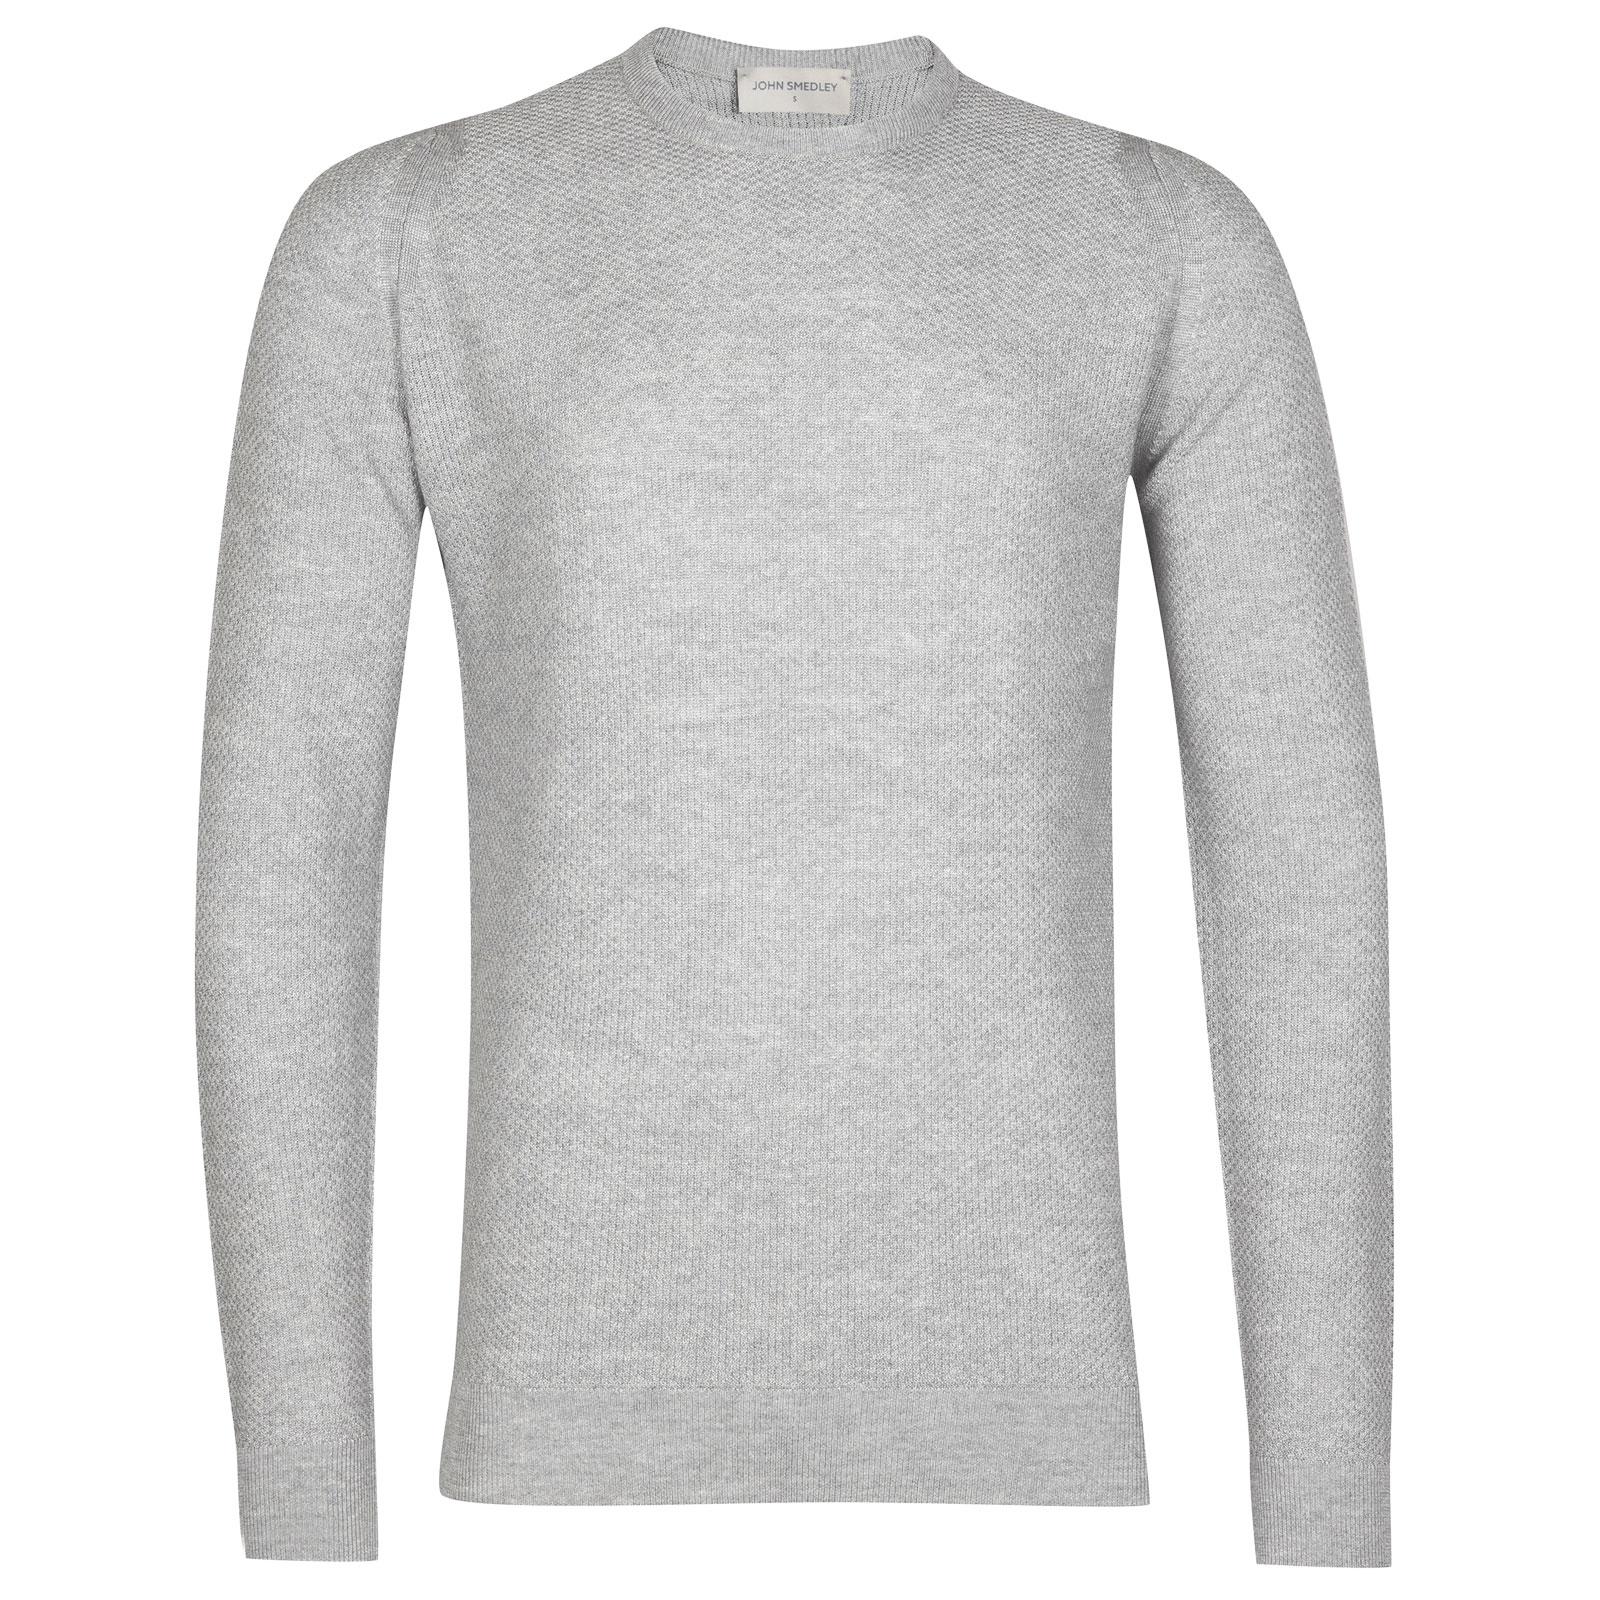 John Smedley 1Singular Merino Wool Pullover in Bardot Grey-XS